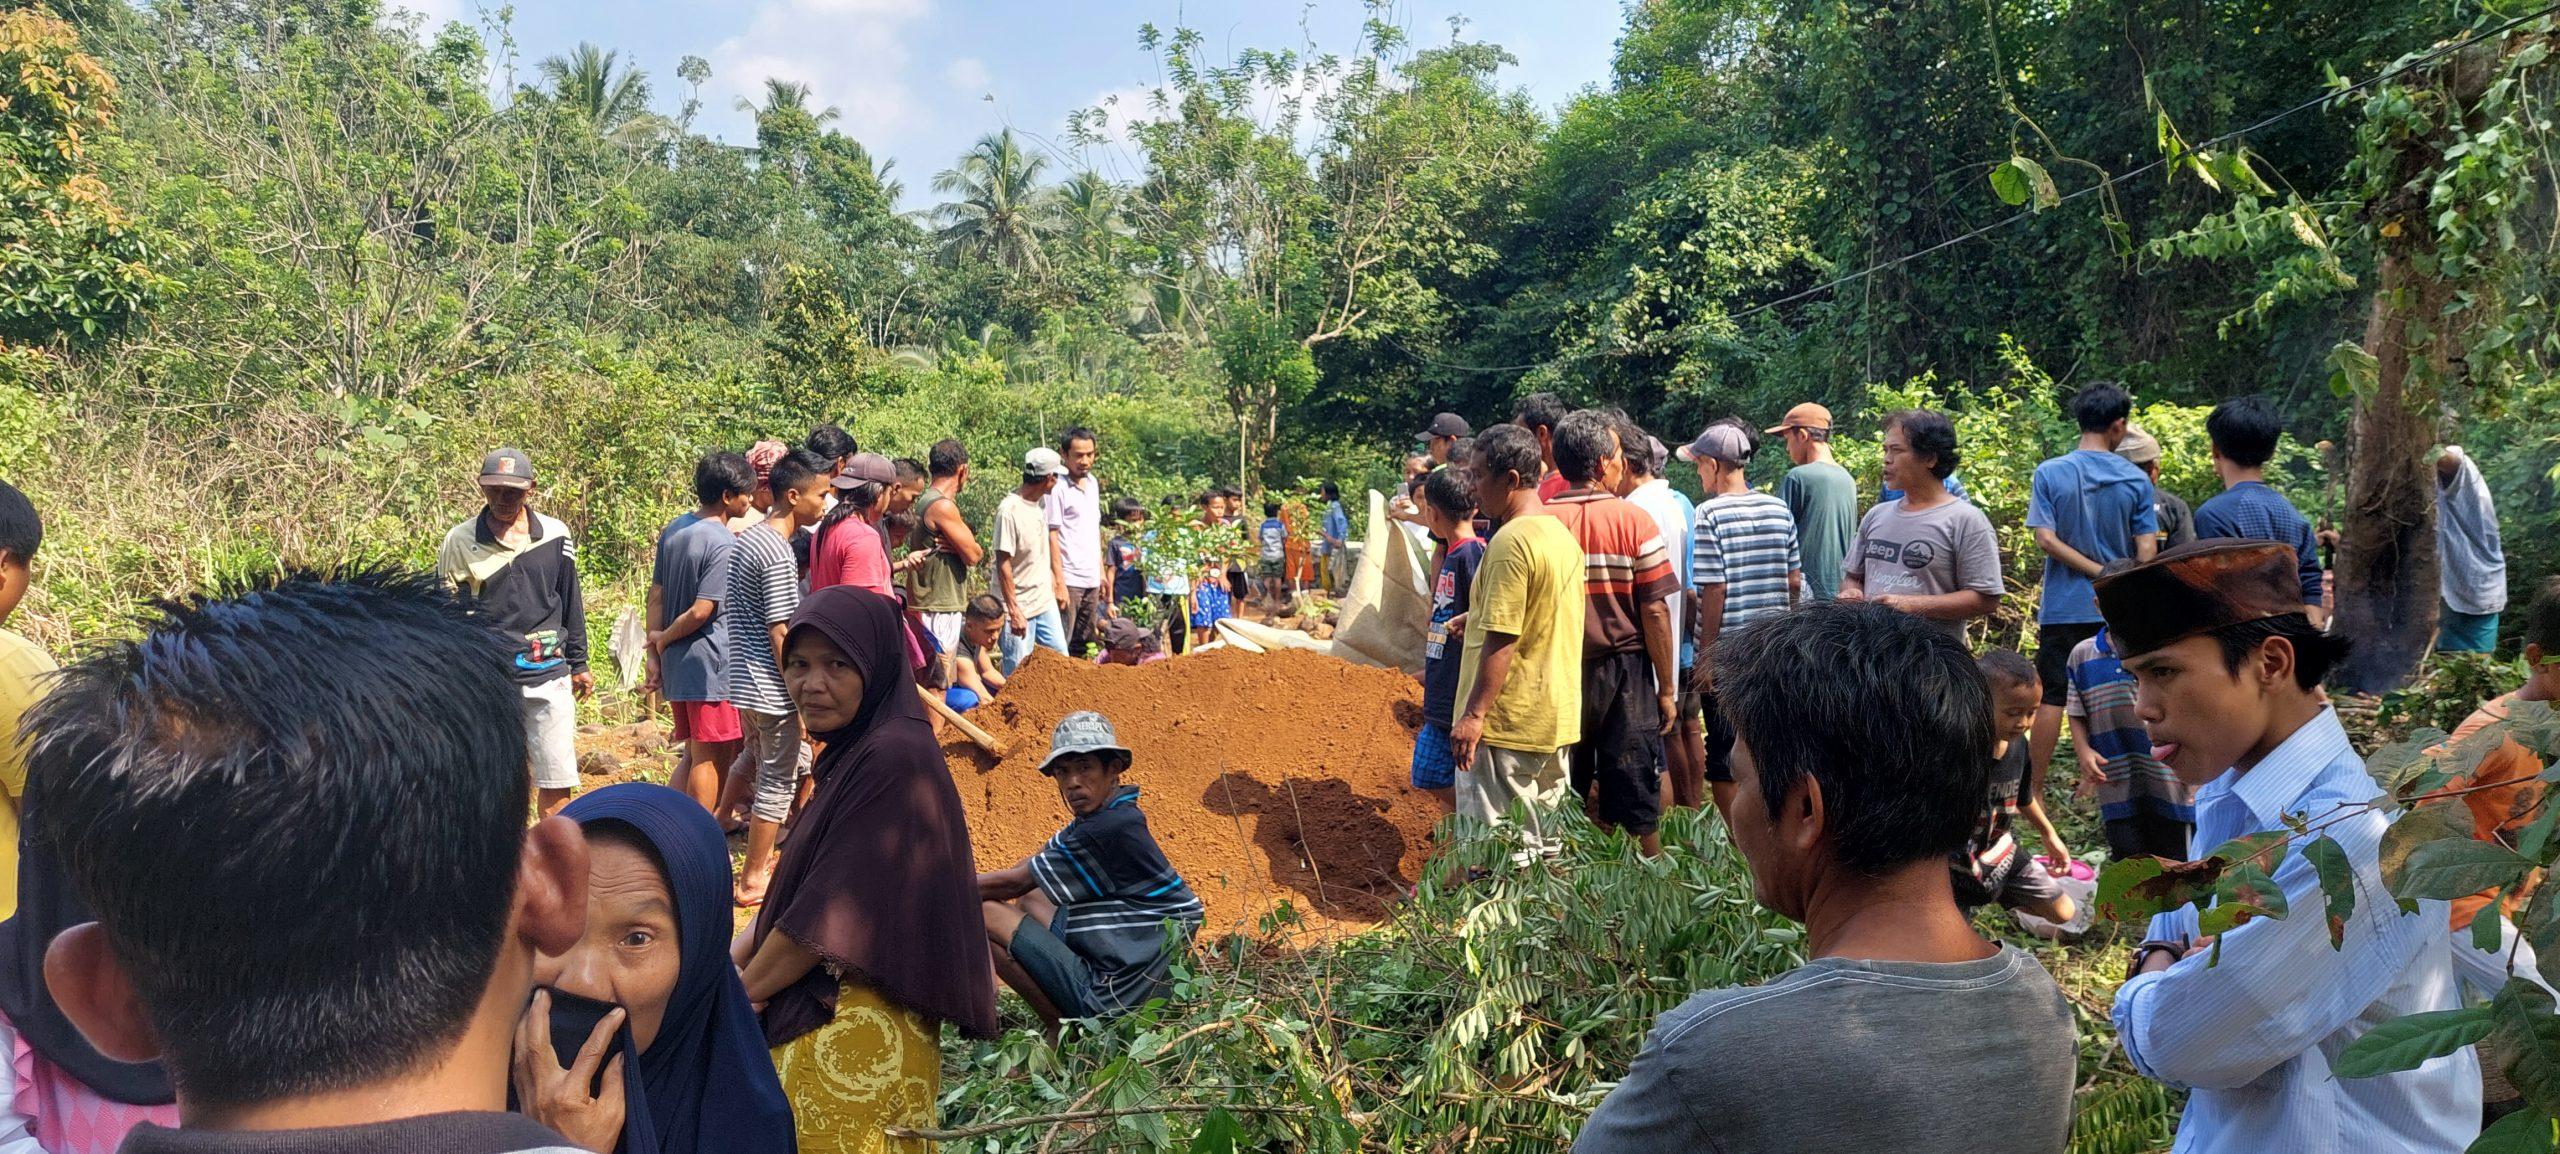 Gambar Berbeda Pilihan Cakades, Keluarga Alm Terpaksa Bongkar Kuburan 17